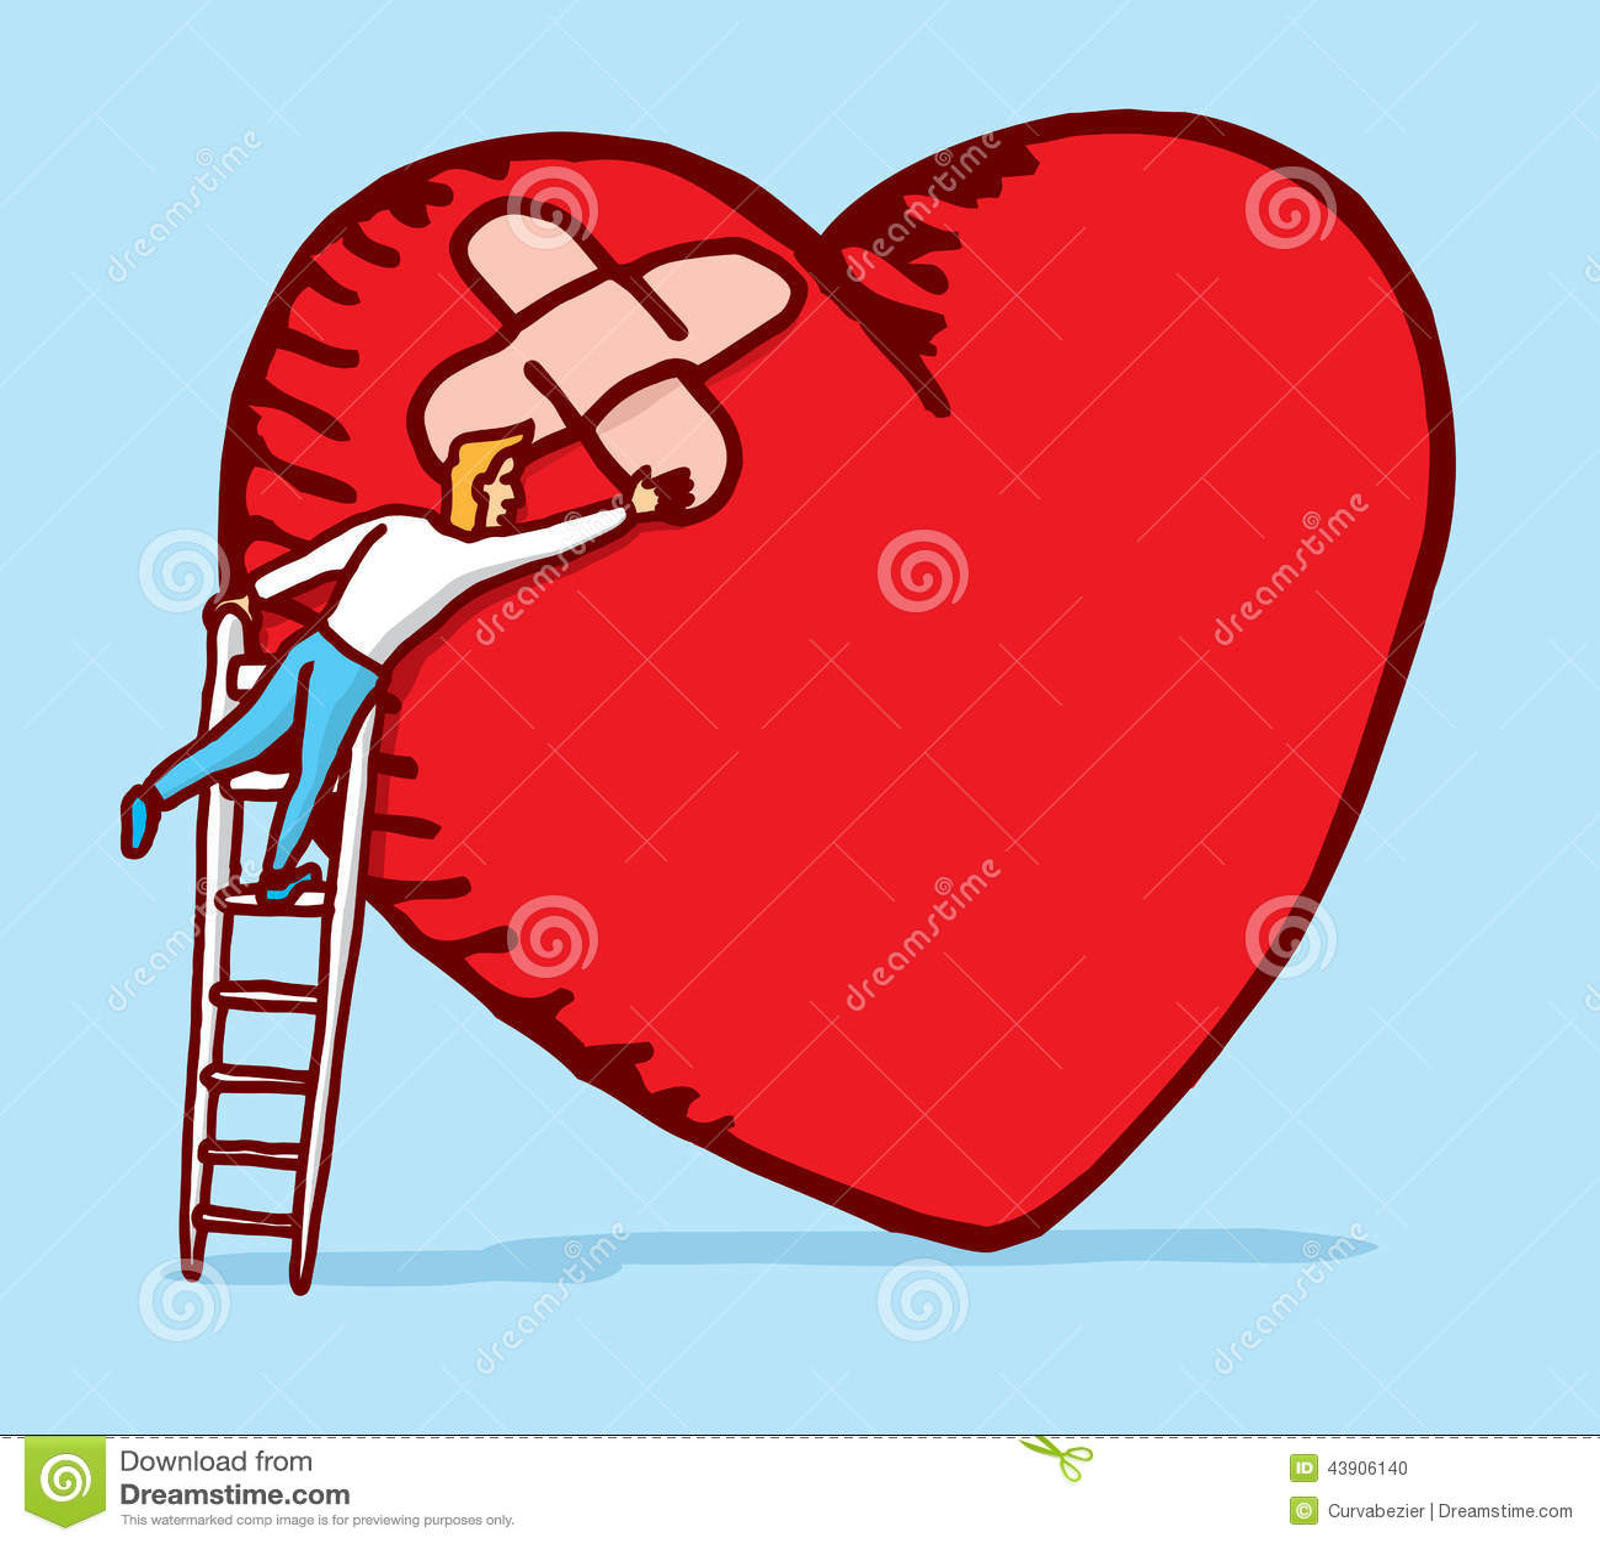 healing and caring a broken heart stock vector image